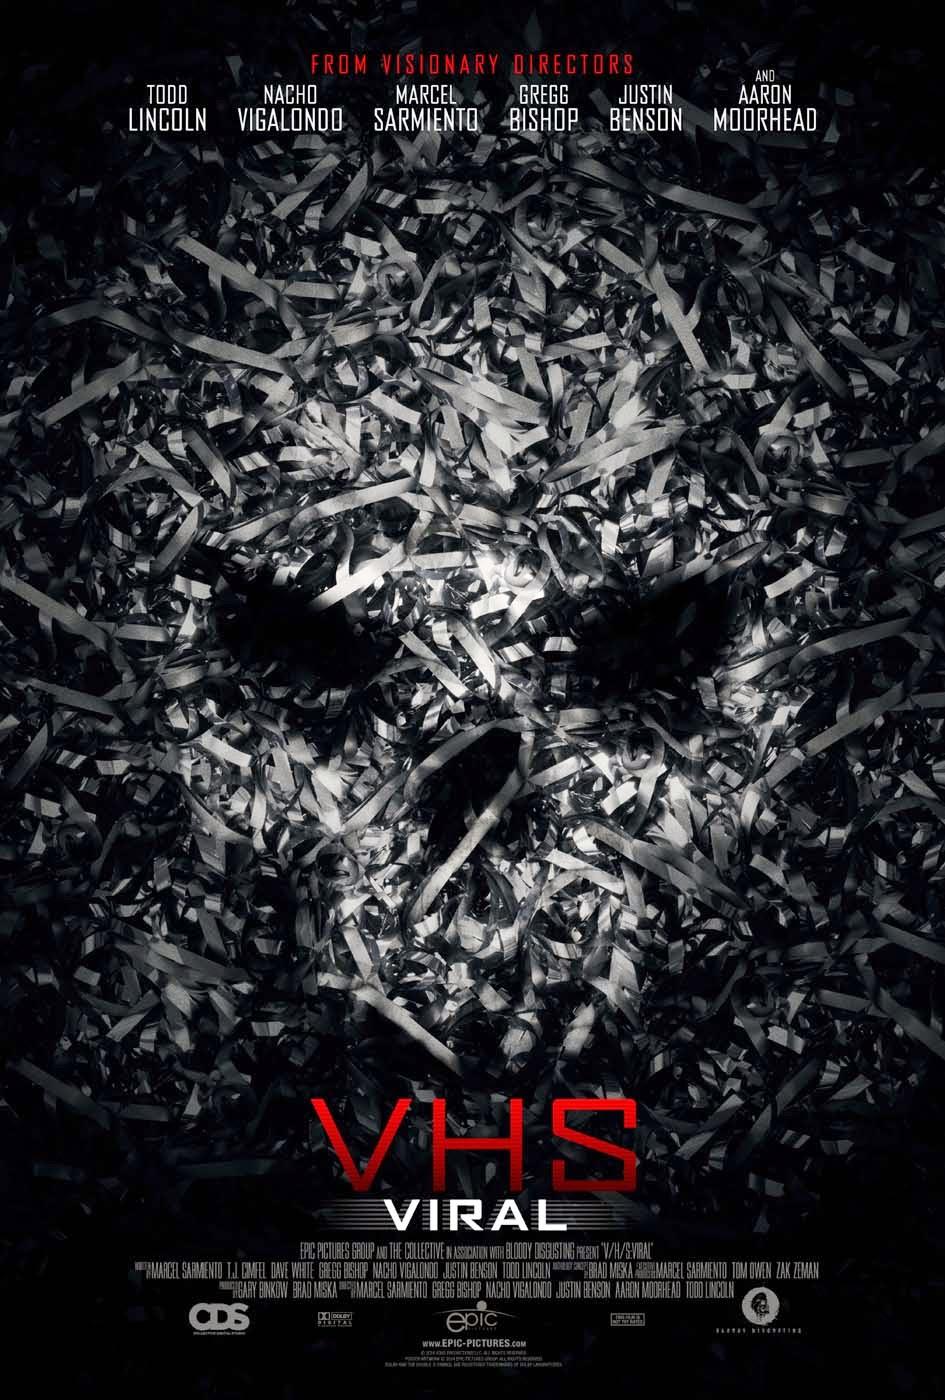 http://horrorsci-fiandmore.blogspot.com/p/vhs-viral-2014.html